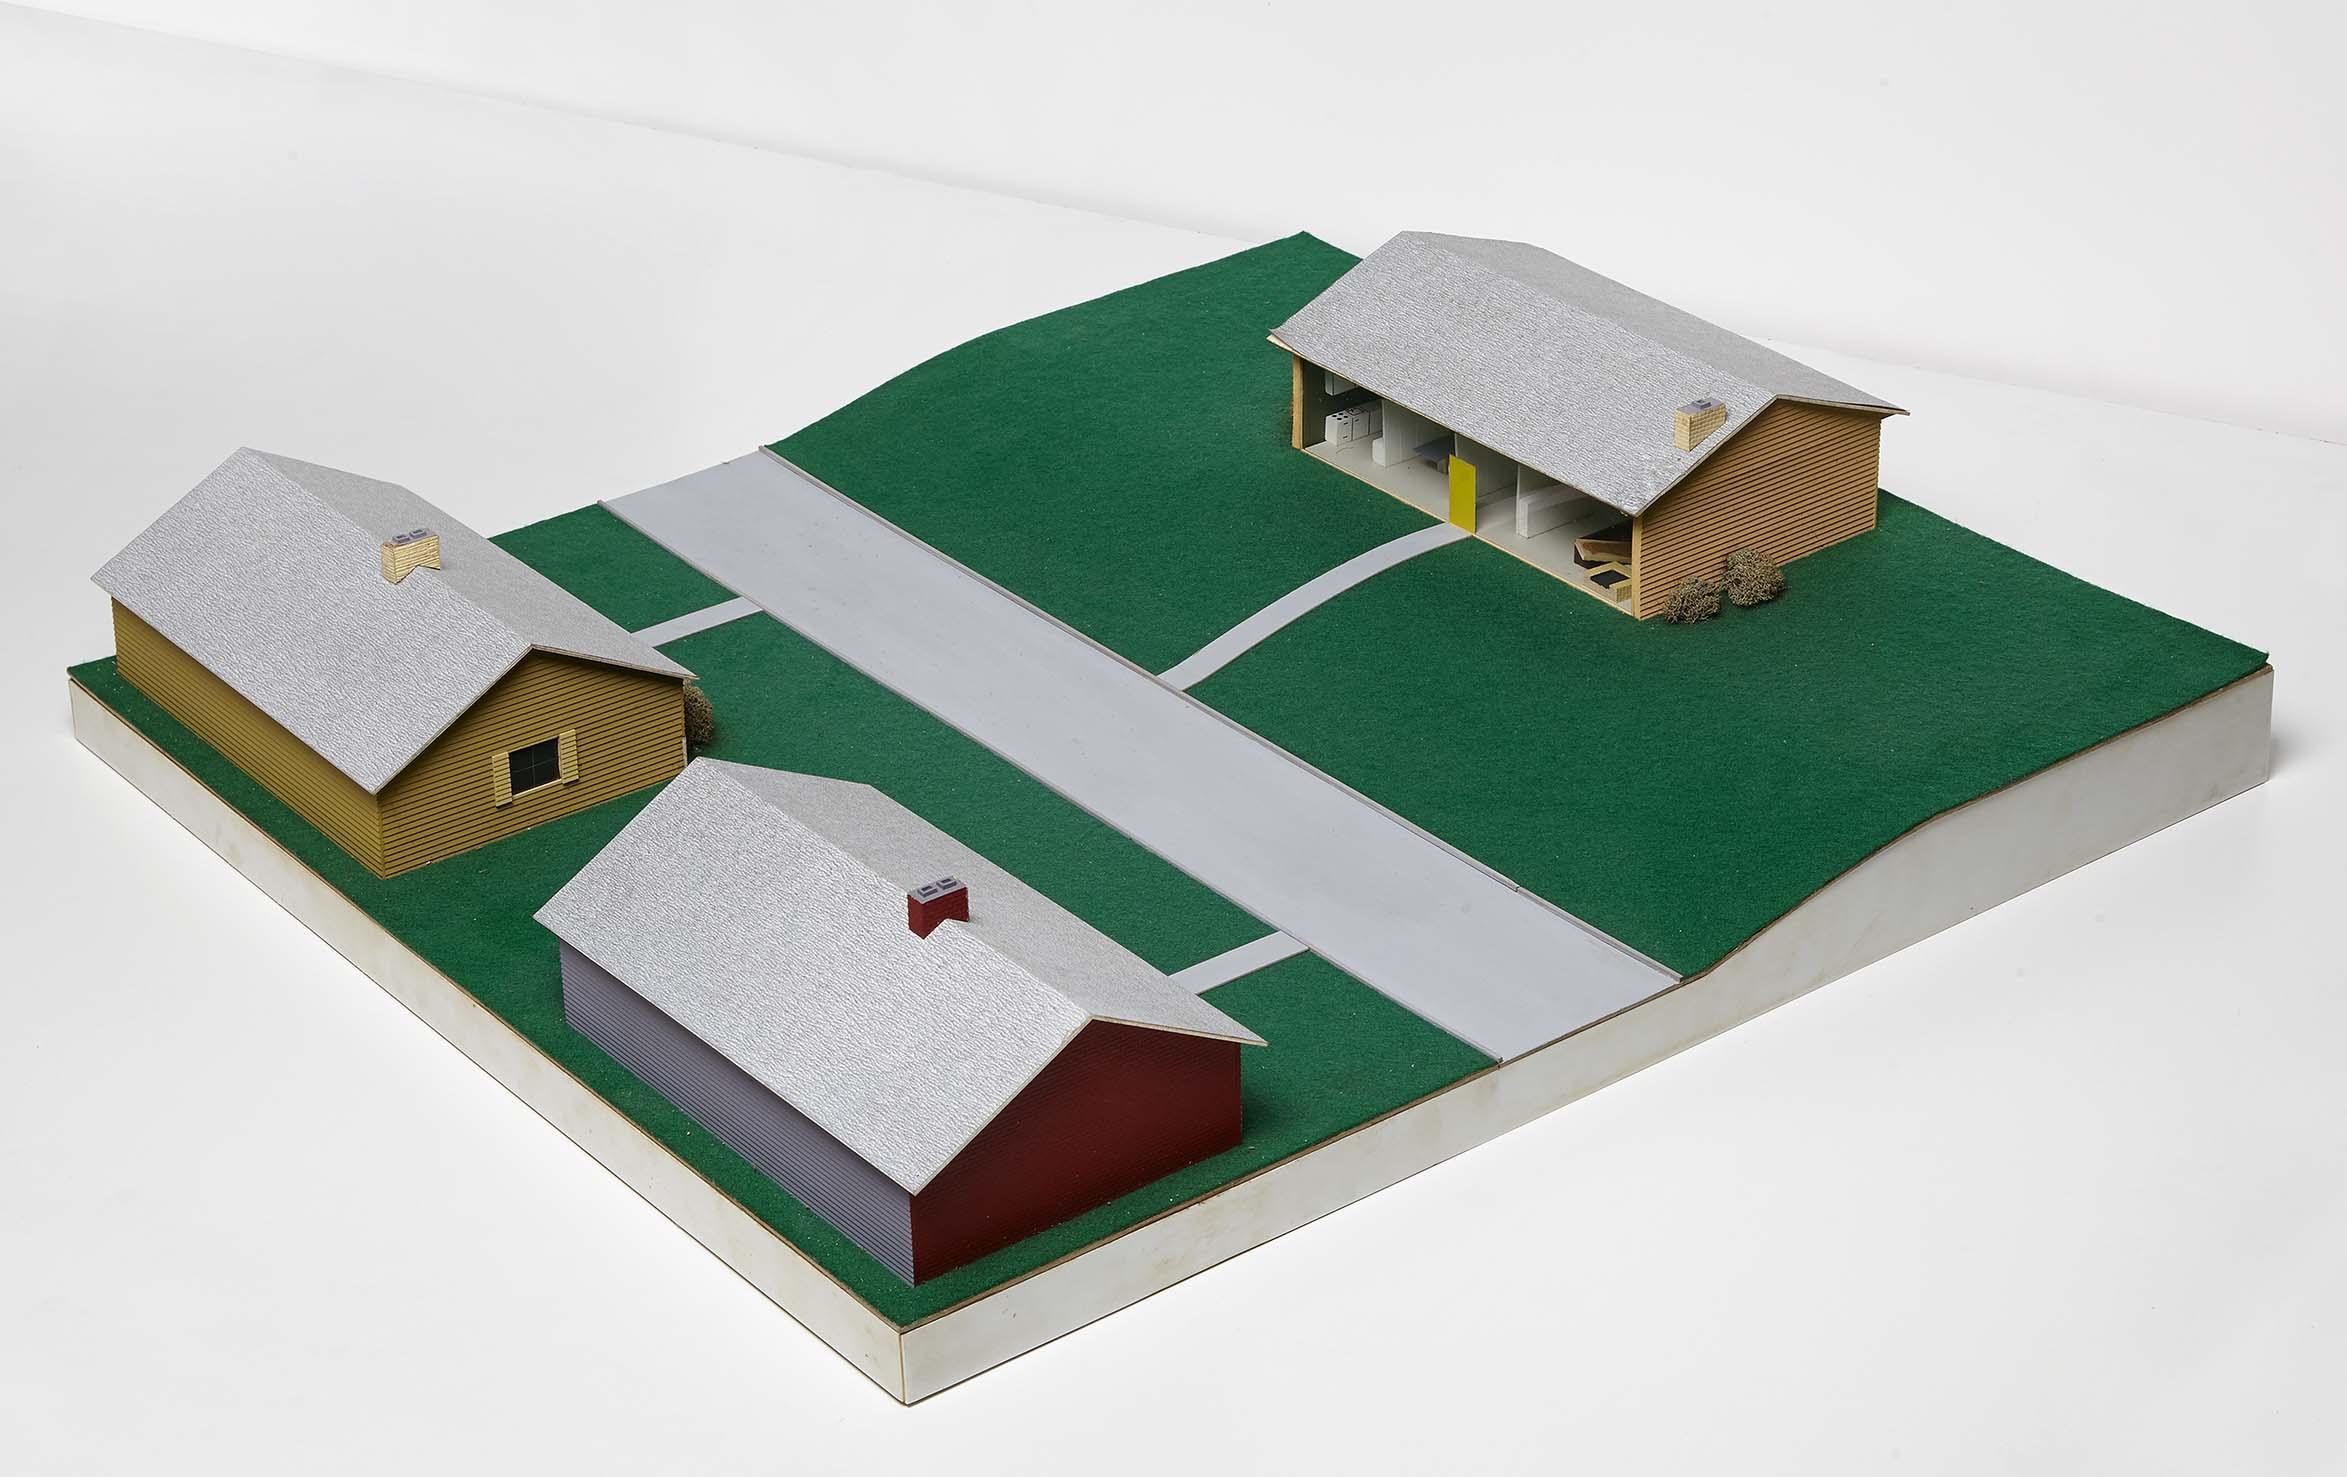 dan graham alteration to a suburban house